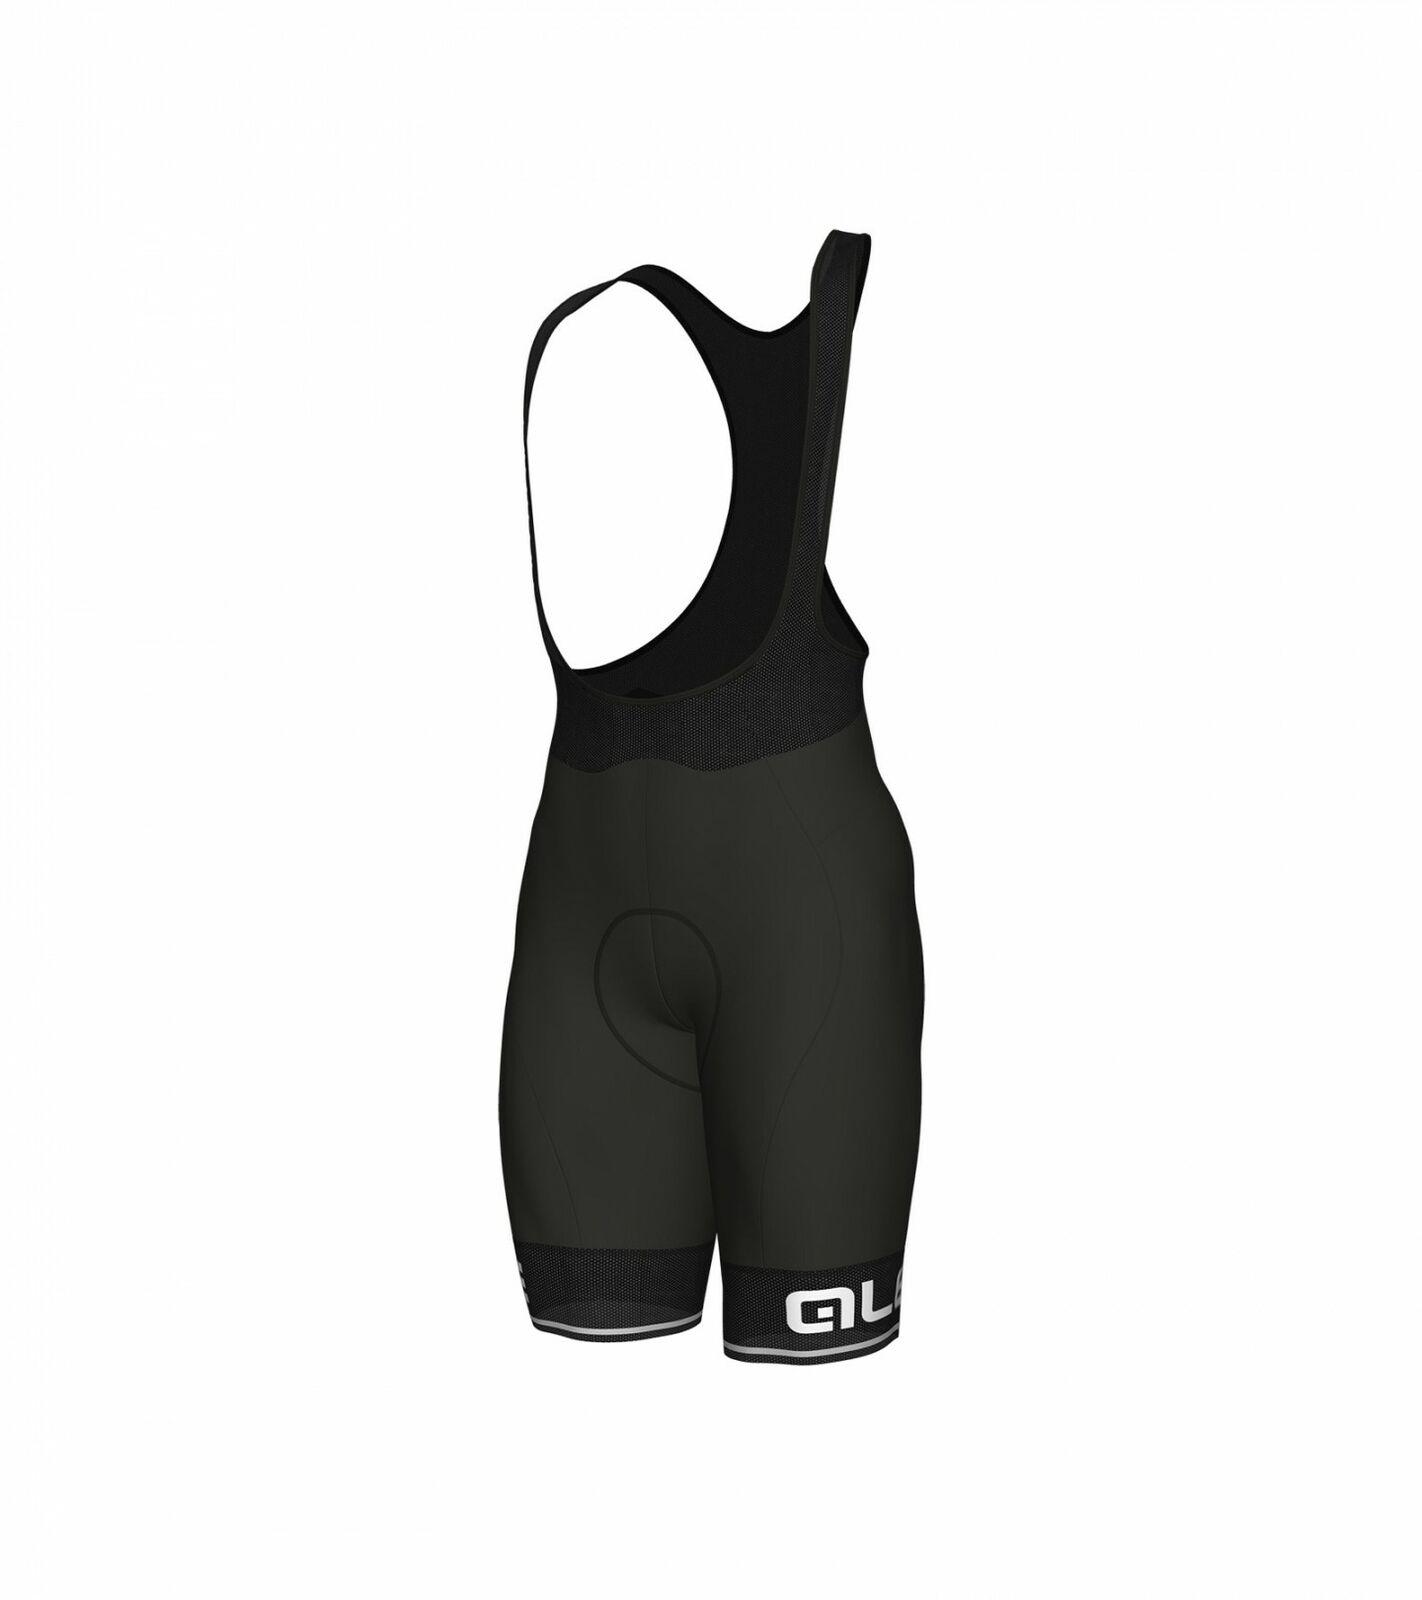 Pantaloncini ciclismo ALE' SOLID CORSA schwarz-bianco 2019